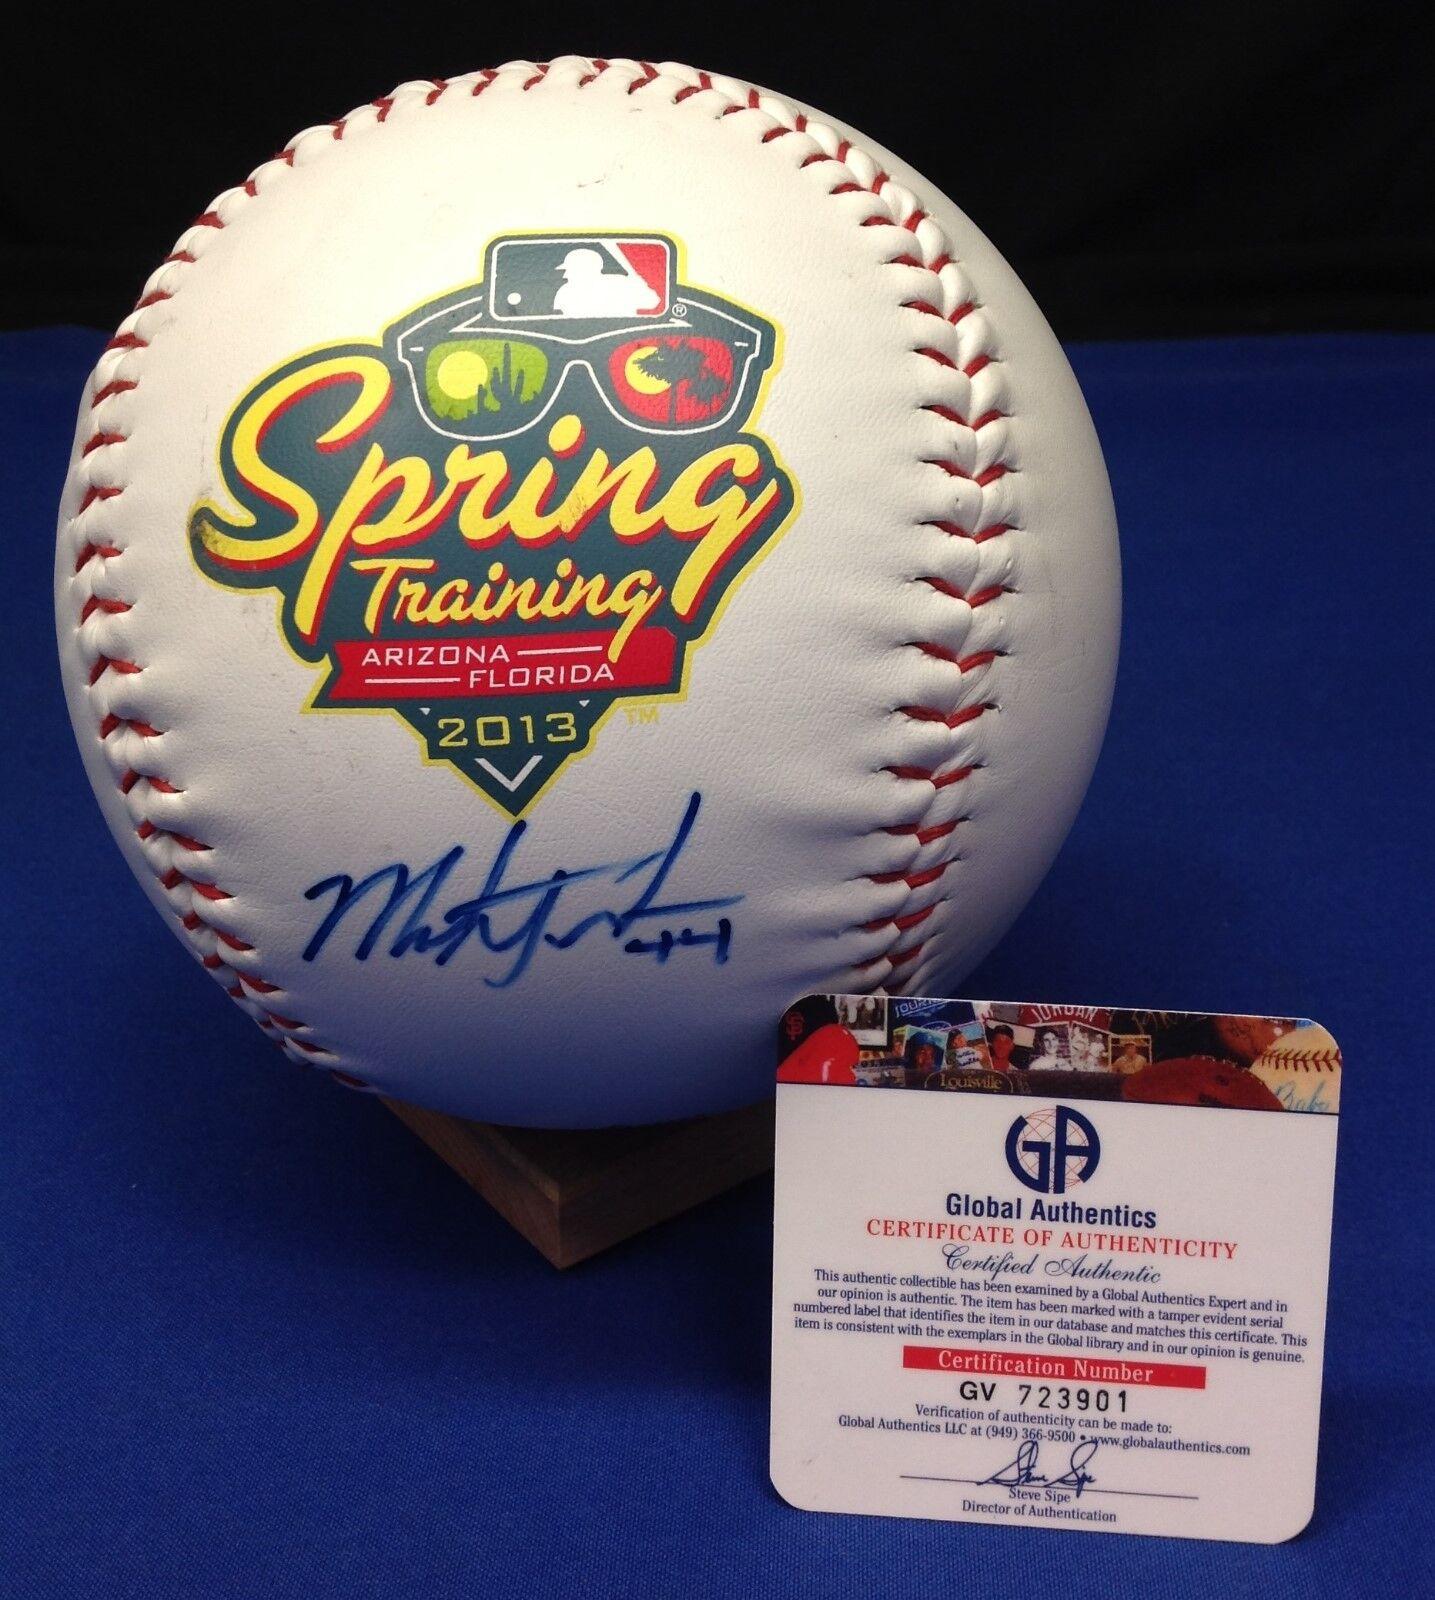 MARK TRUMBO Signed Jumbo-Sized Rawlings MLB Baseball - GA # GV723901